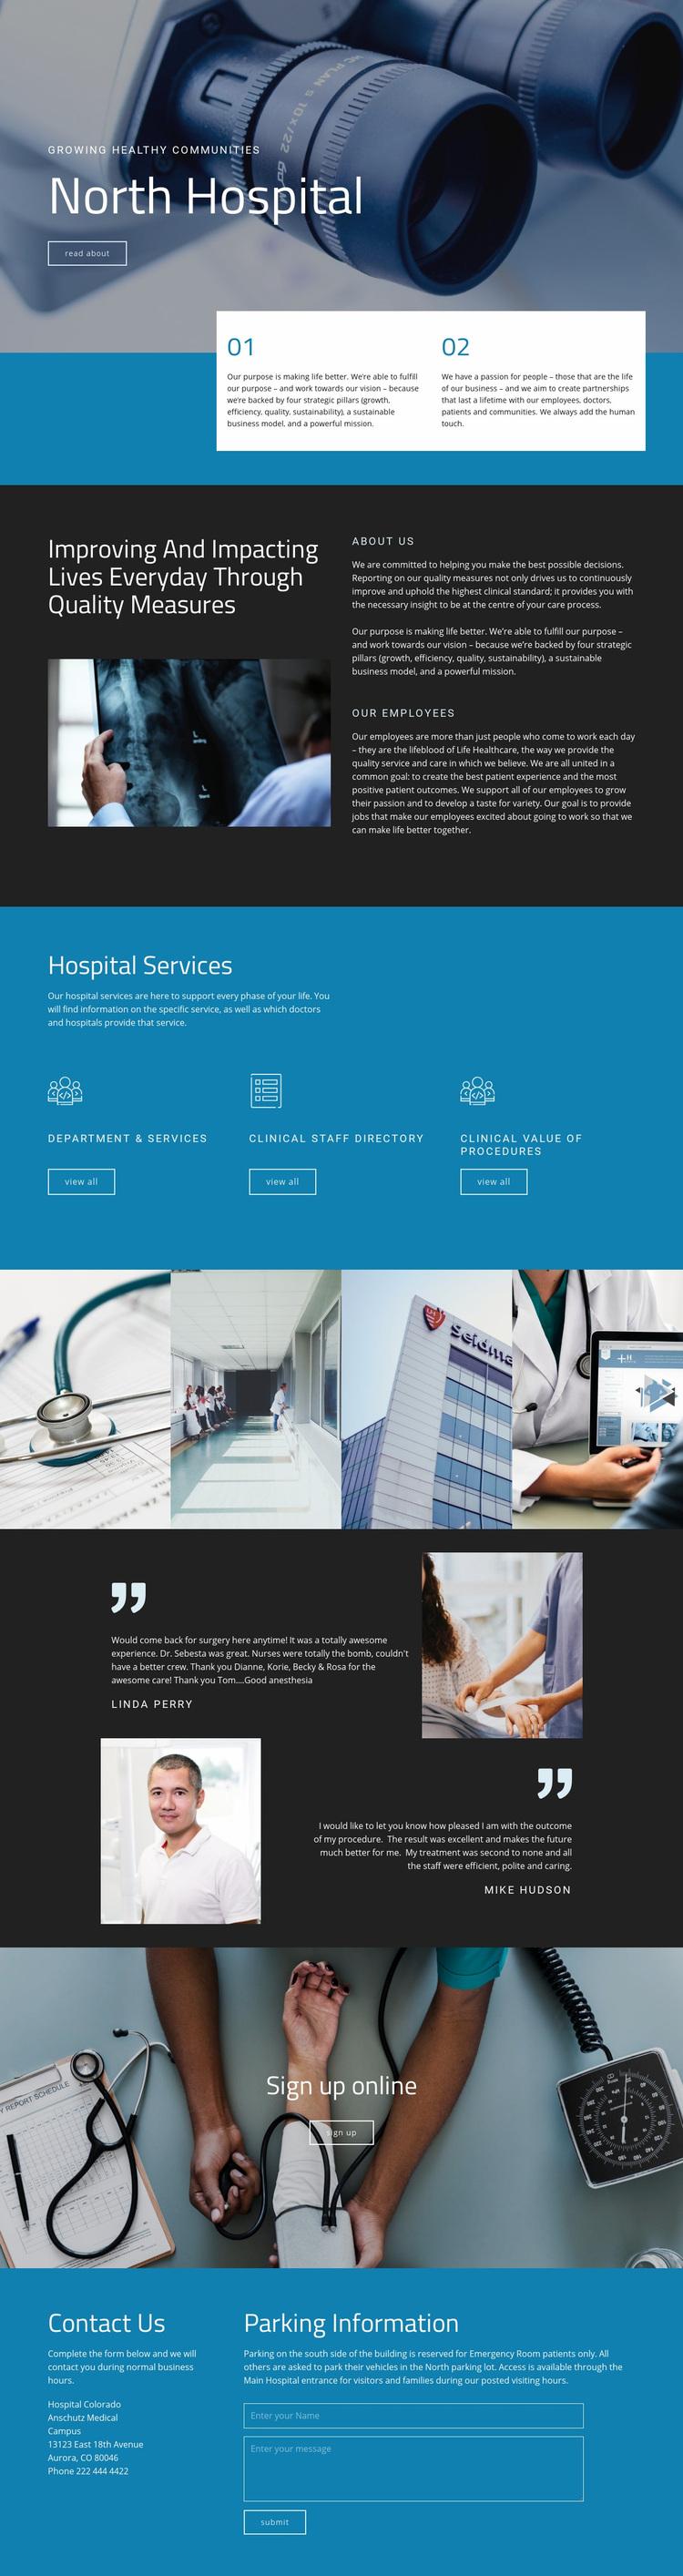 Impacting lives with medicine Web Page Designer